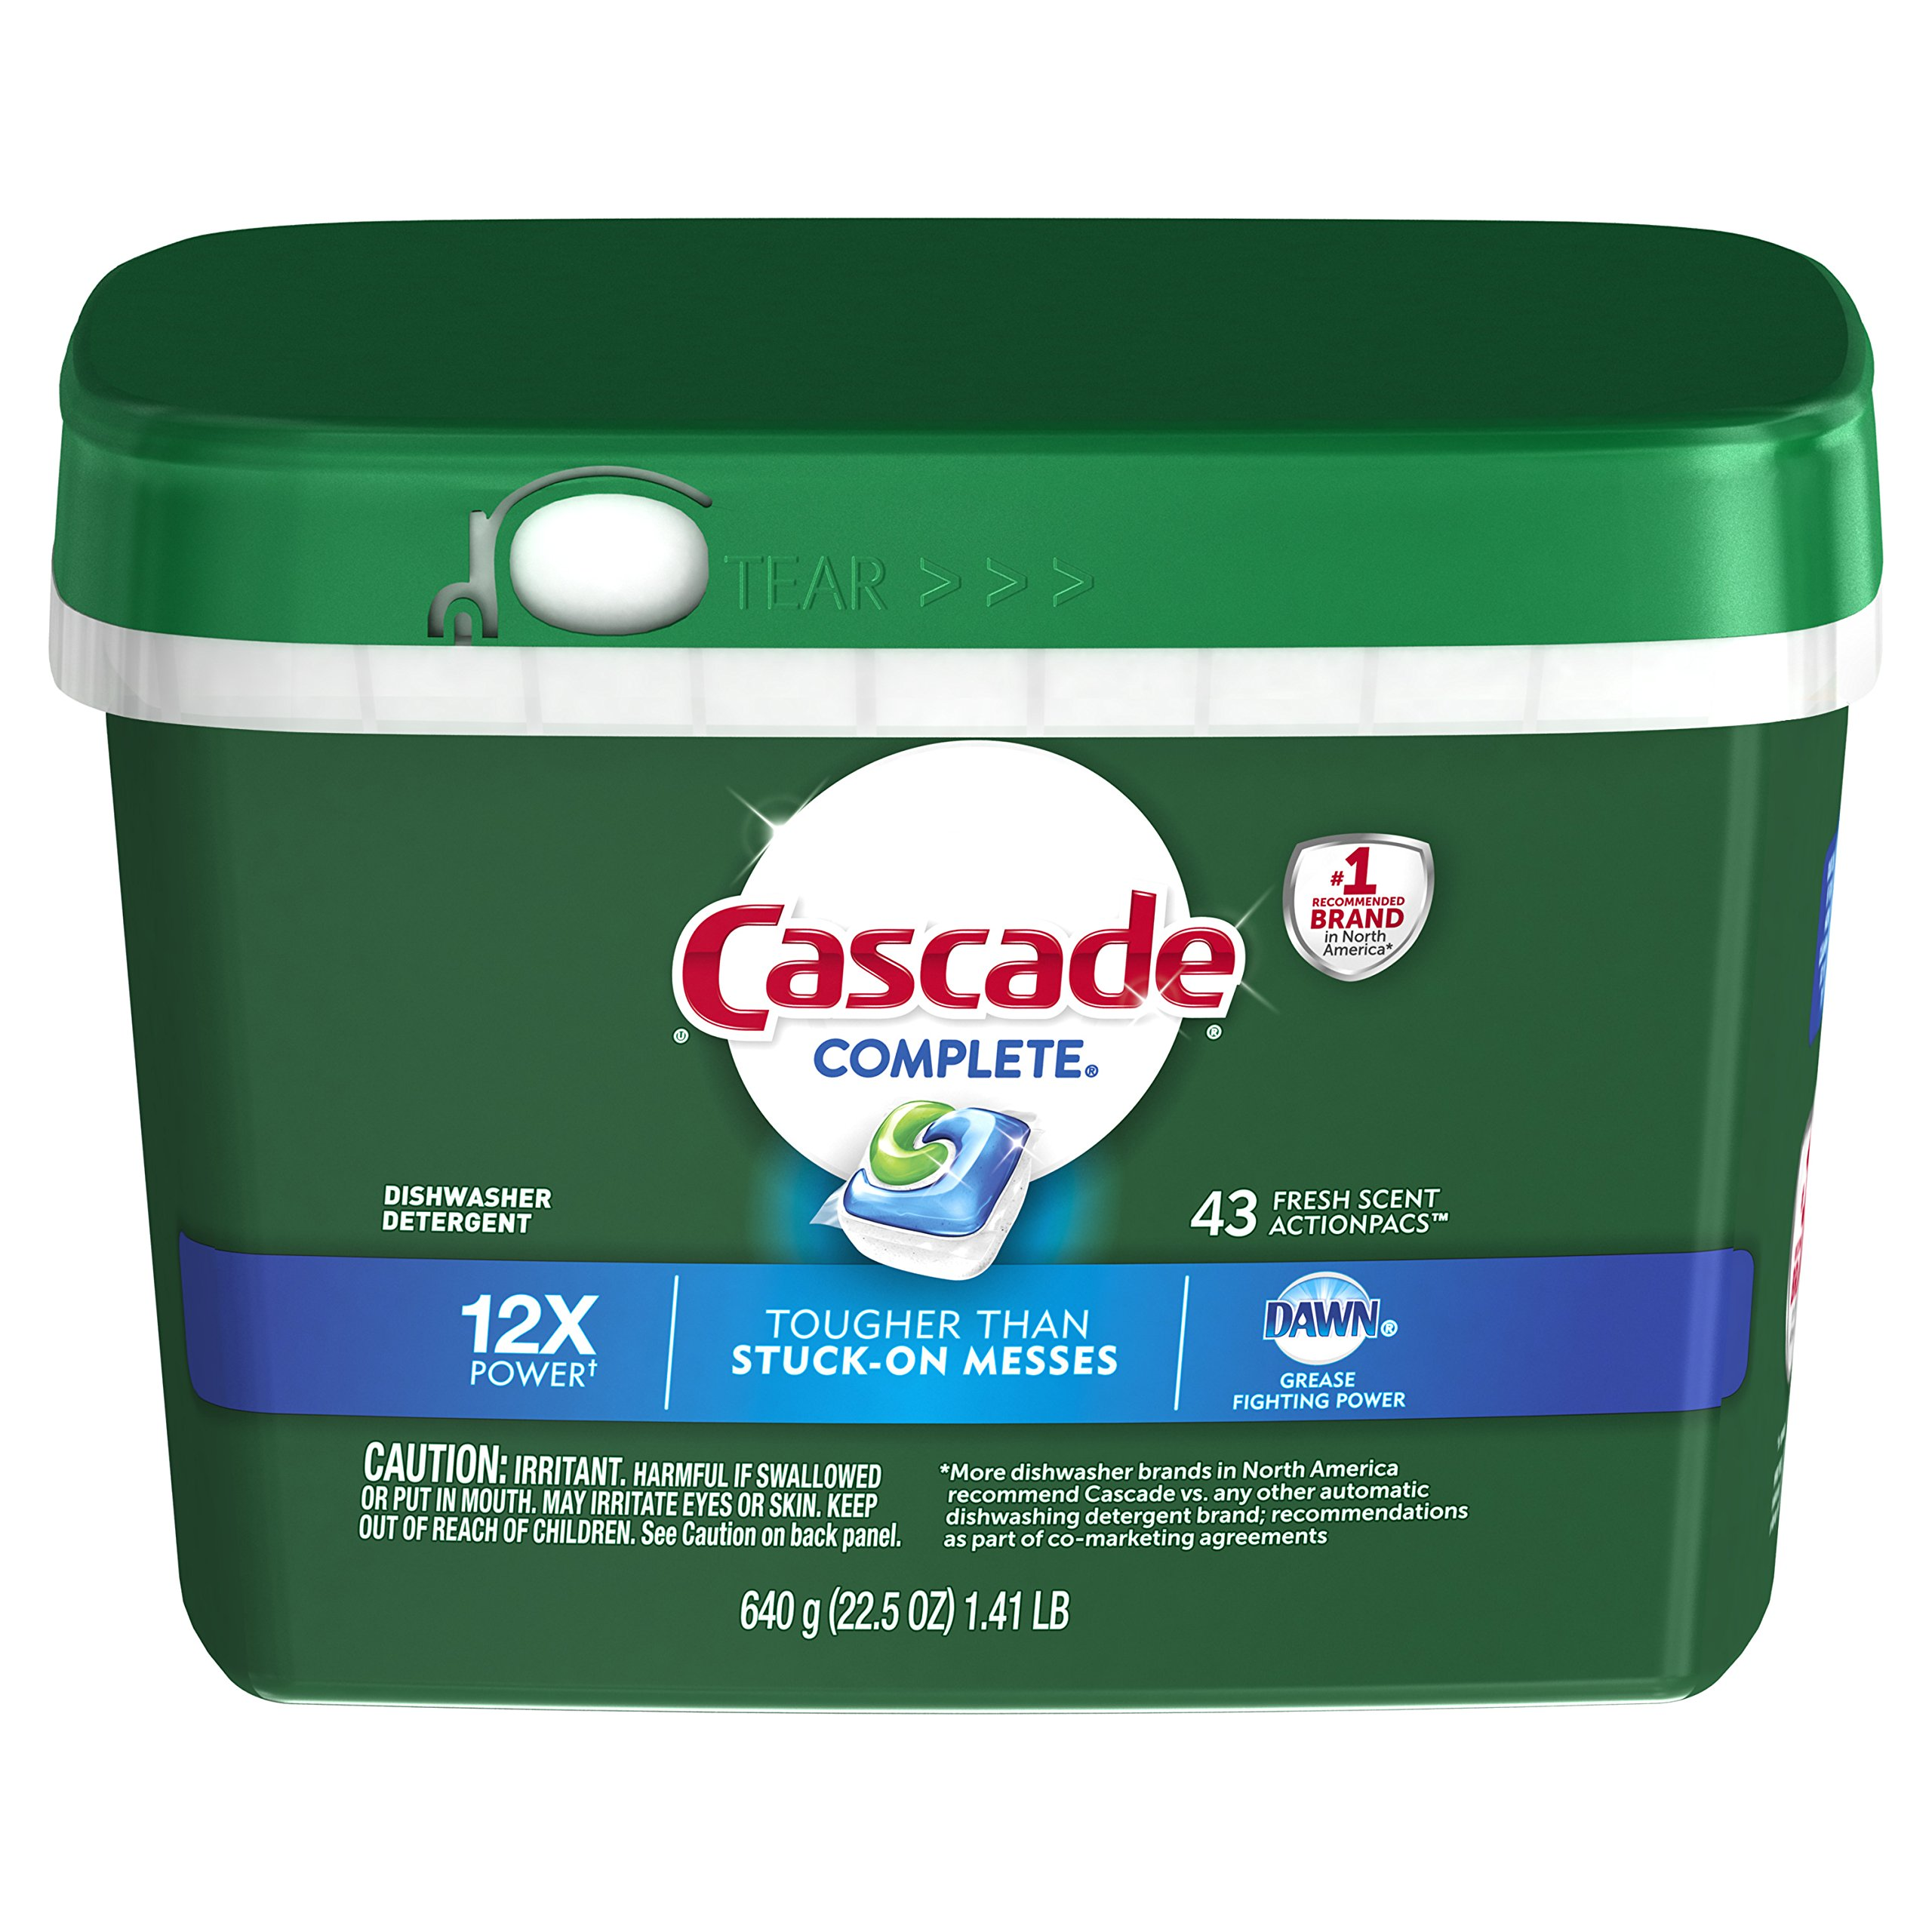 Cascade Complete Dishwasher Detergent, Fresh Scent, 43 Count